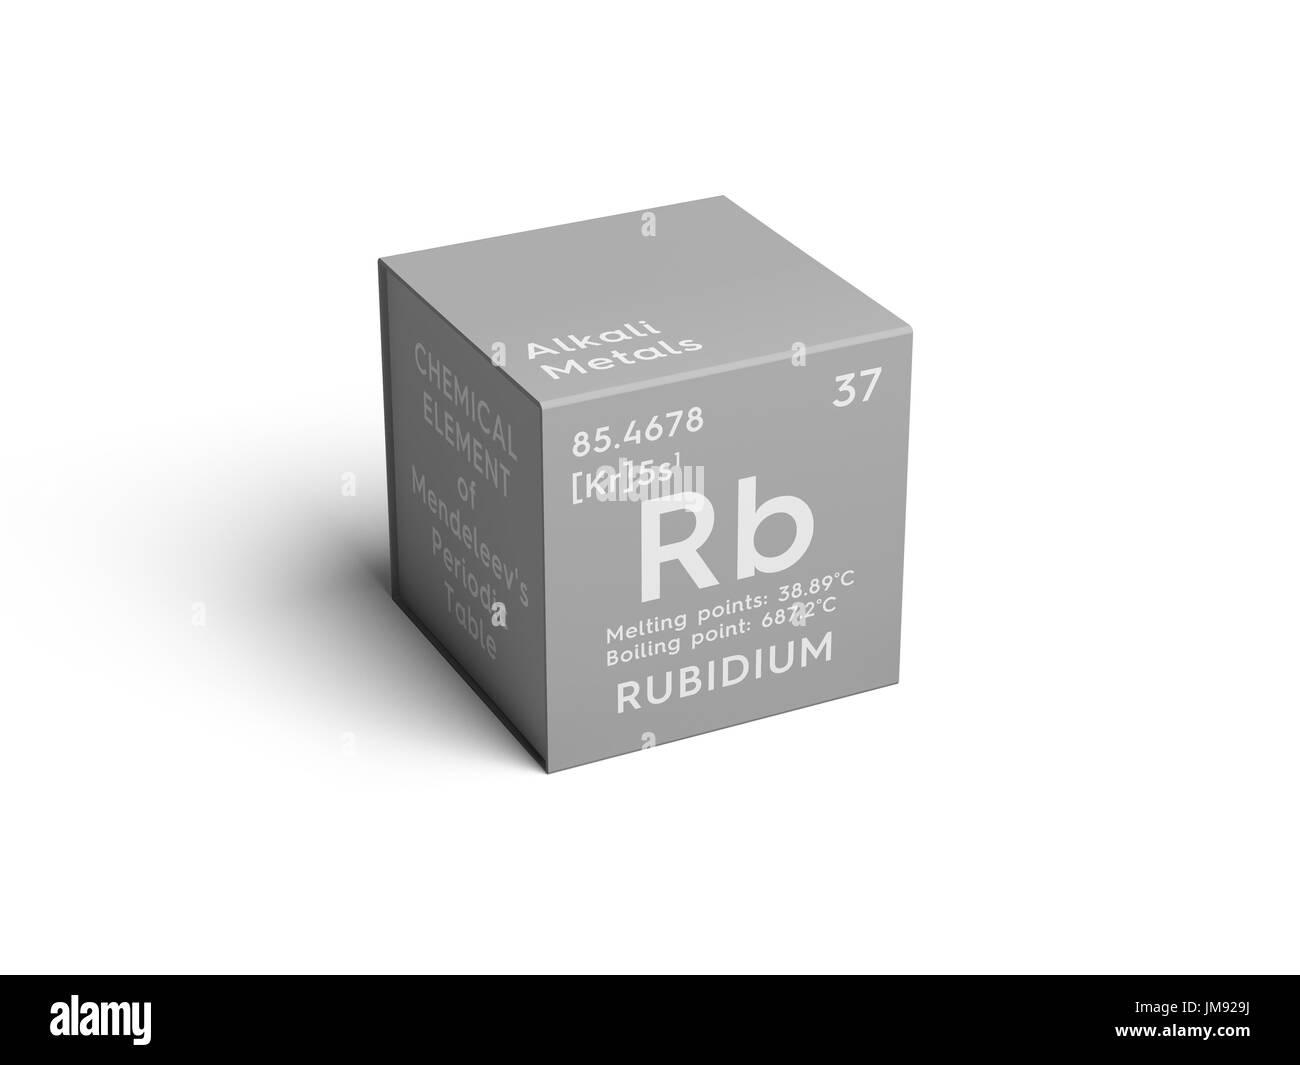 Rubidium stock photos rubidium stock images alamy chemical element of mendeleevs periodic table rubidium in square cube buycottarizona Choice Image